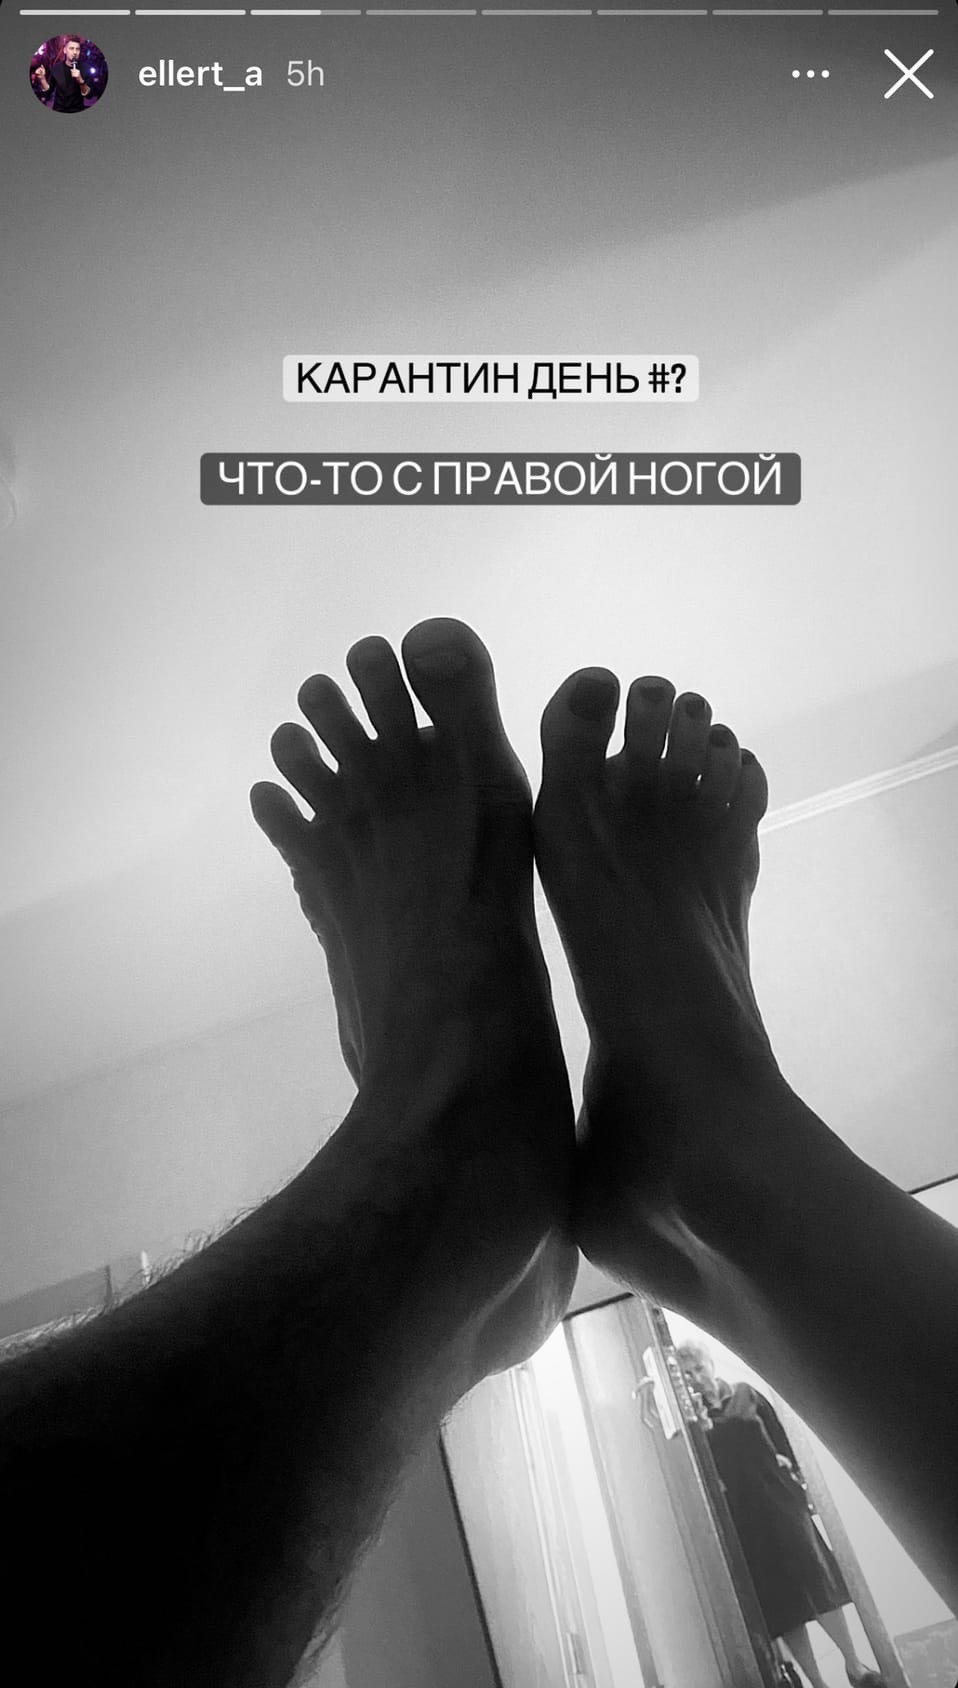 Ksenia Mishina - Sasha Ellert - Bachelorette Ukraine -  Season 1 - Discussion  - Page 7 NjlLGNyEfcg